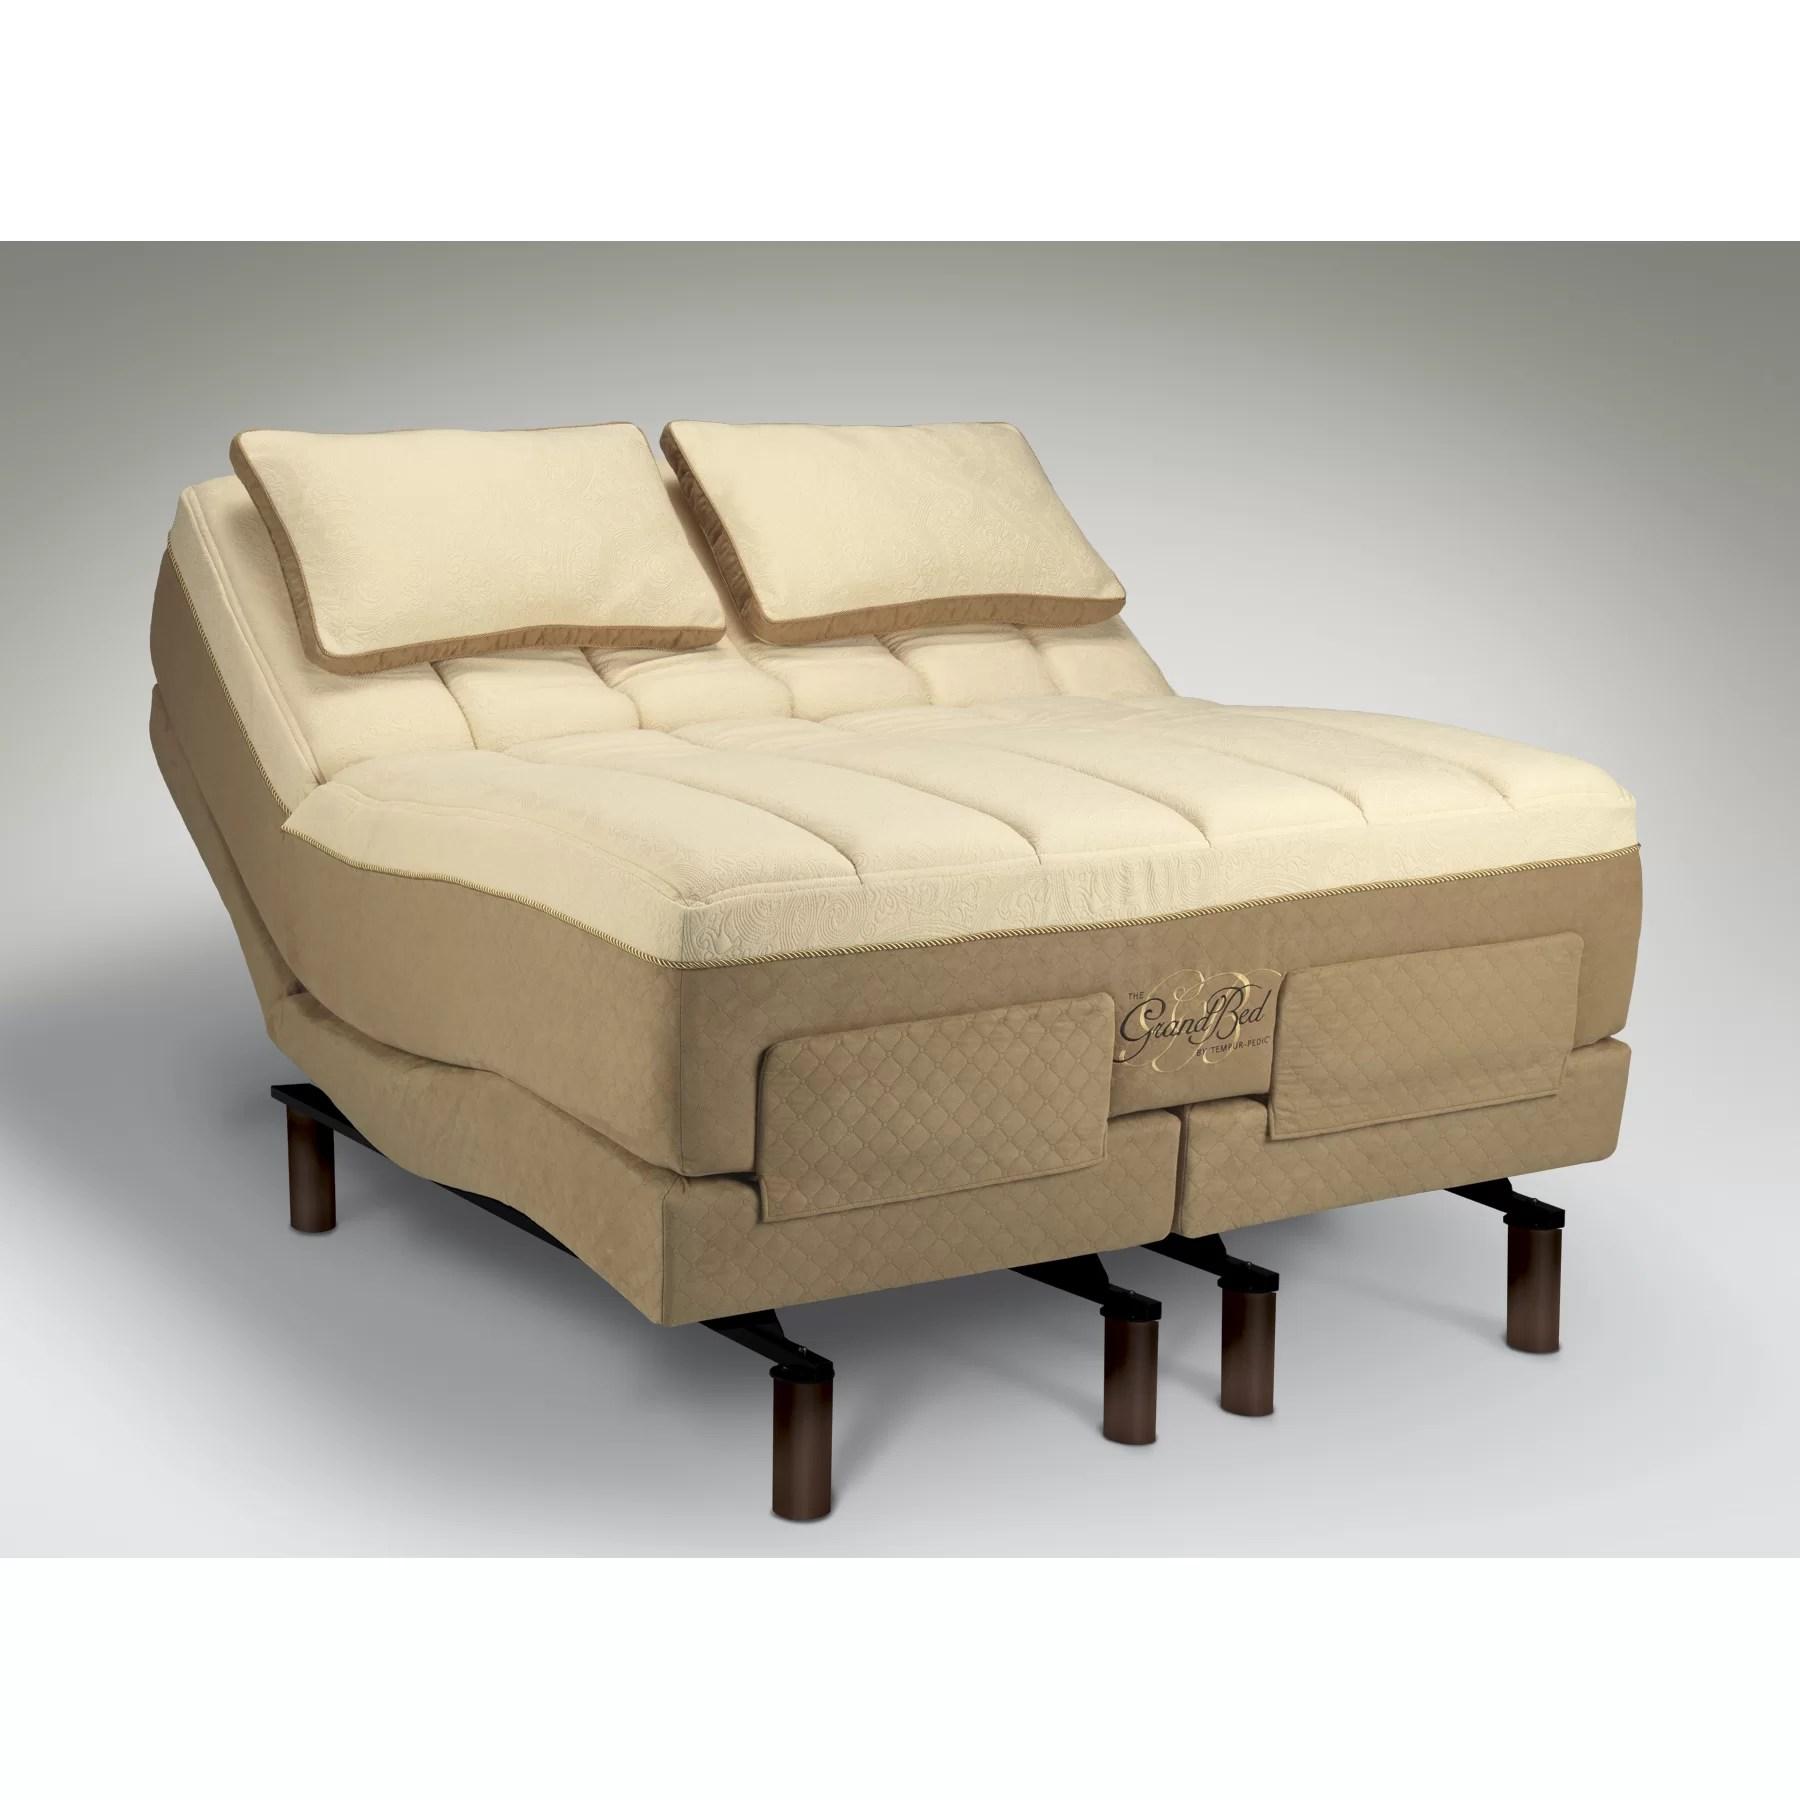 Tempur-Pedic TEMPUR-Ergo Adjustable Bed & Reviews | Wayfair